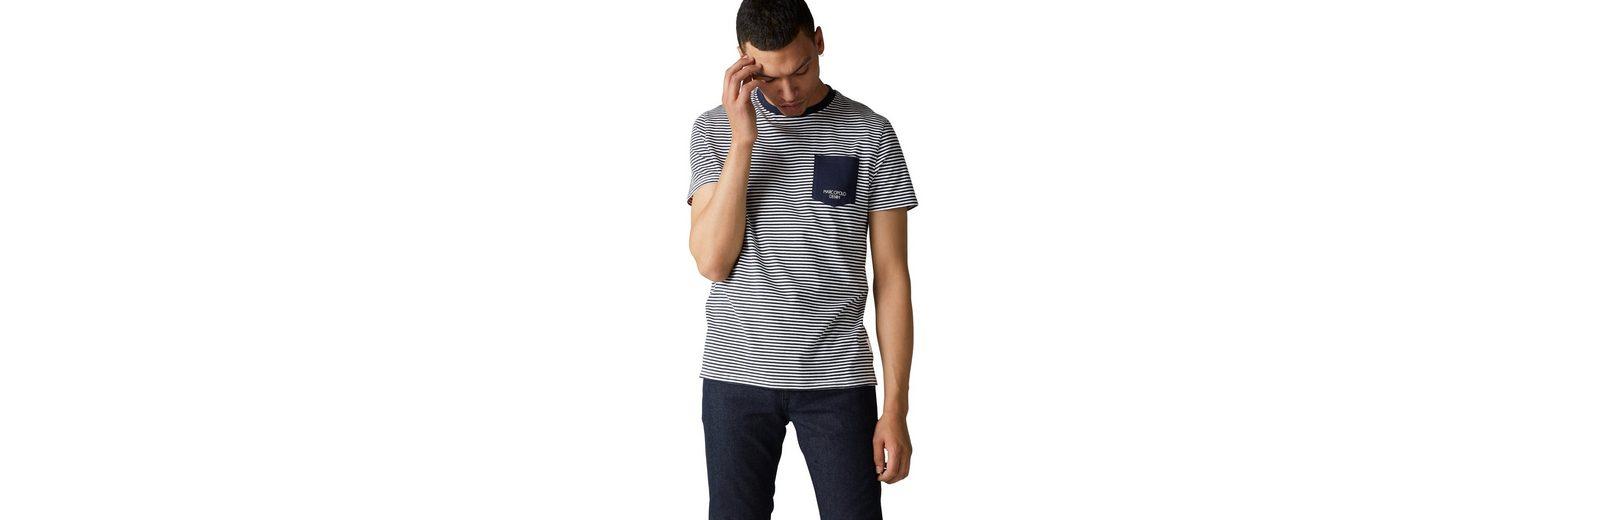 O'polo Marc T Denim shirt Denim Marc T O'polo shirt wwqtprPd